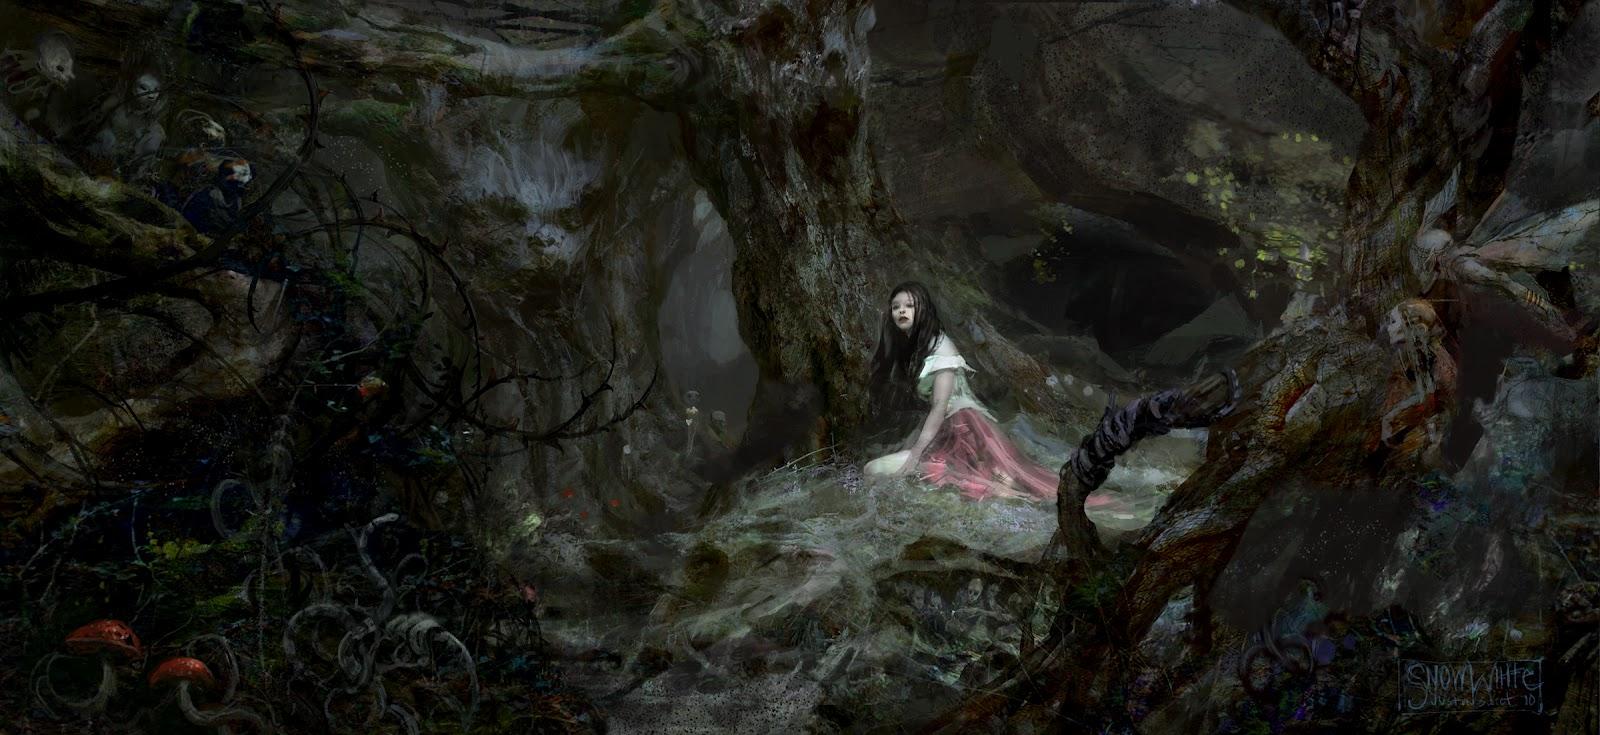 A Fehér Erdő, avagy Hófehérke börtöne Darkforest